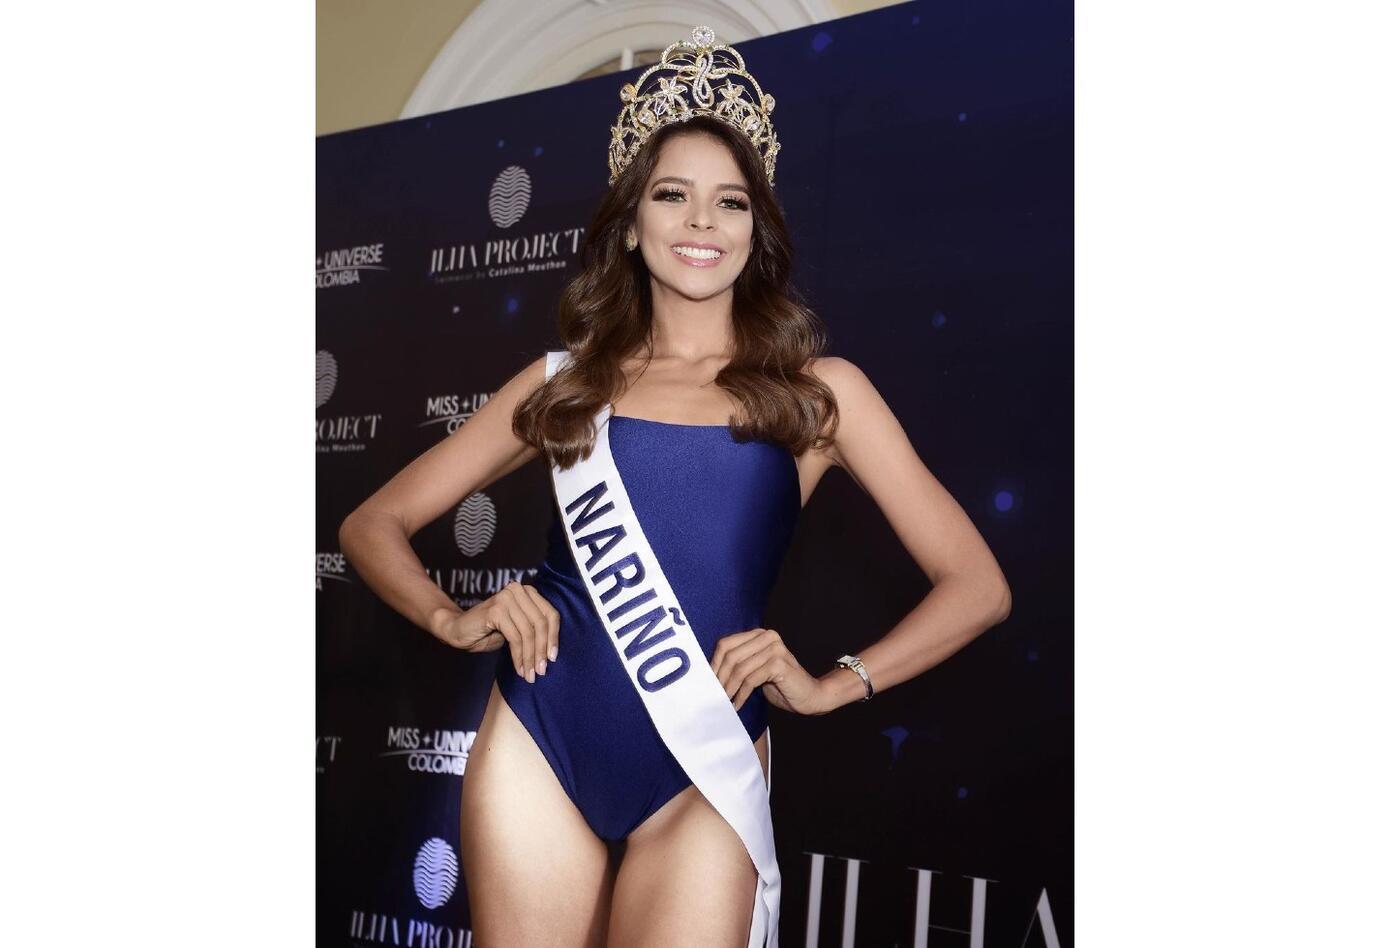 Miss Nariño, Dahiara García